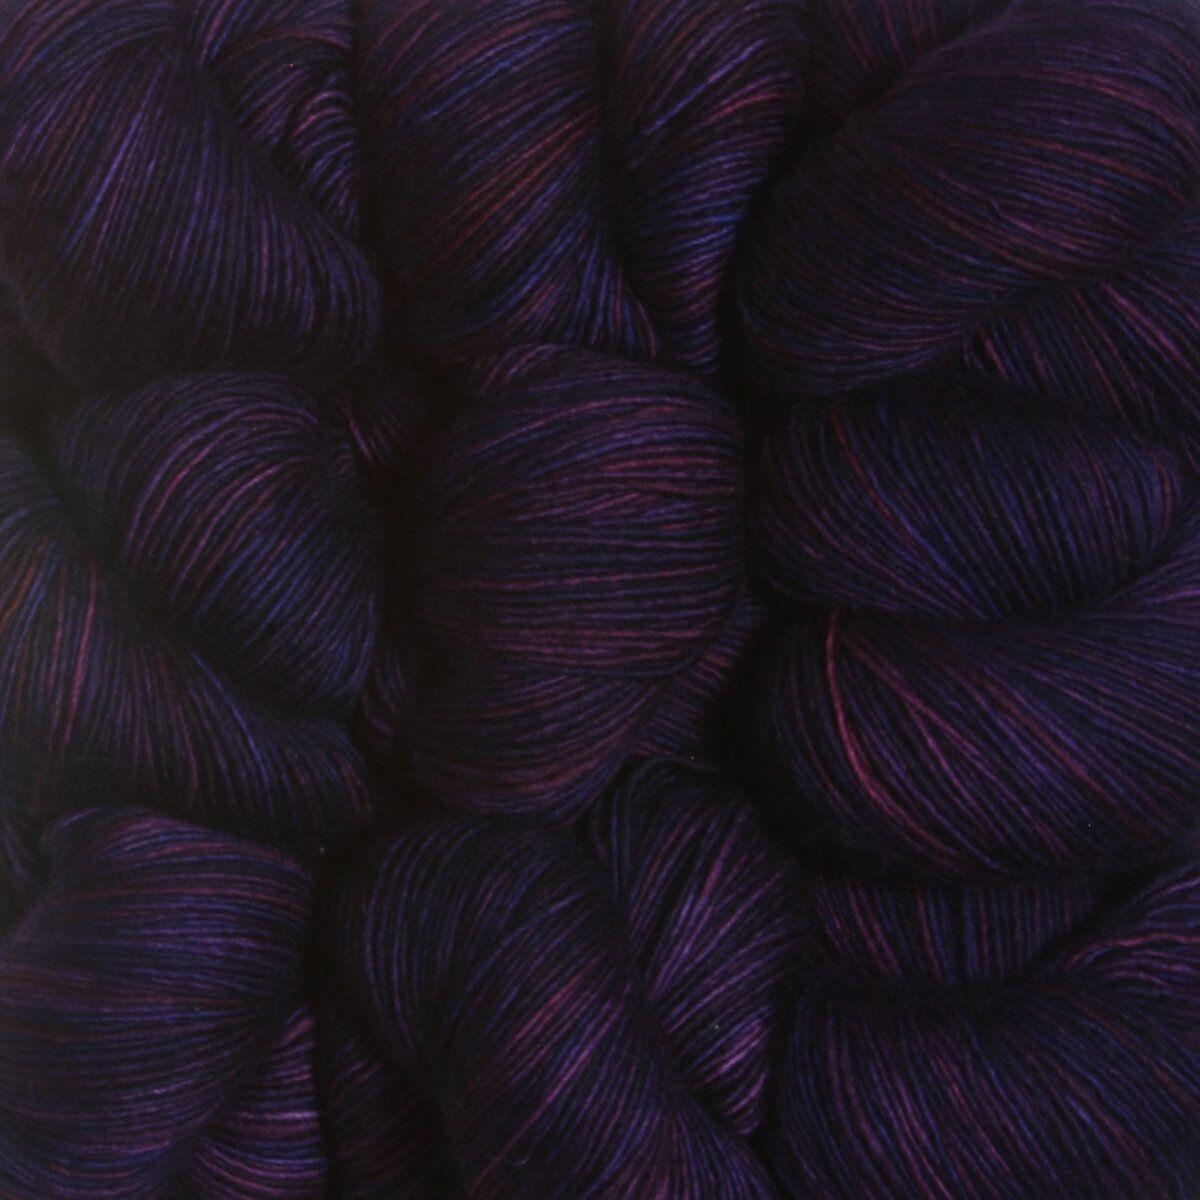 Madelinetosh Tosh Merino Light Yarn - Raspberry Cordial at Jimmy Beans Wool